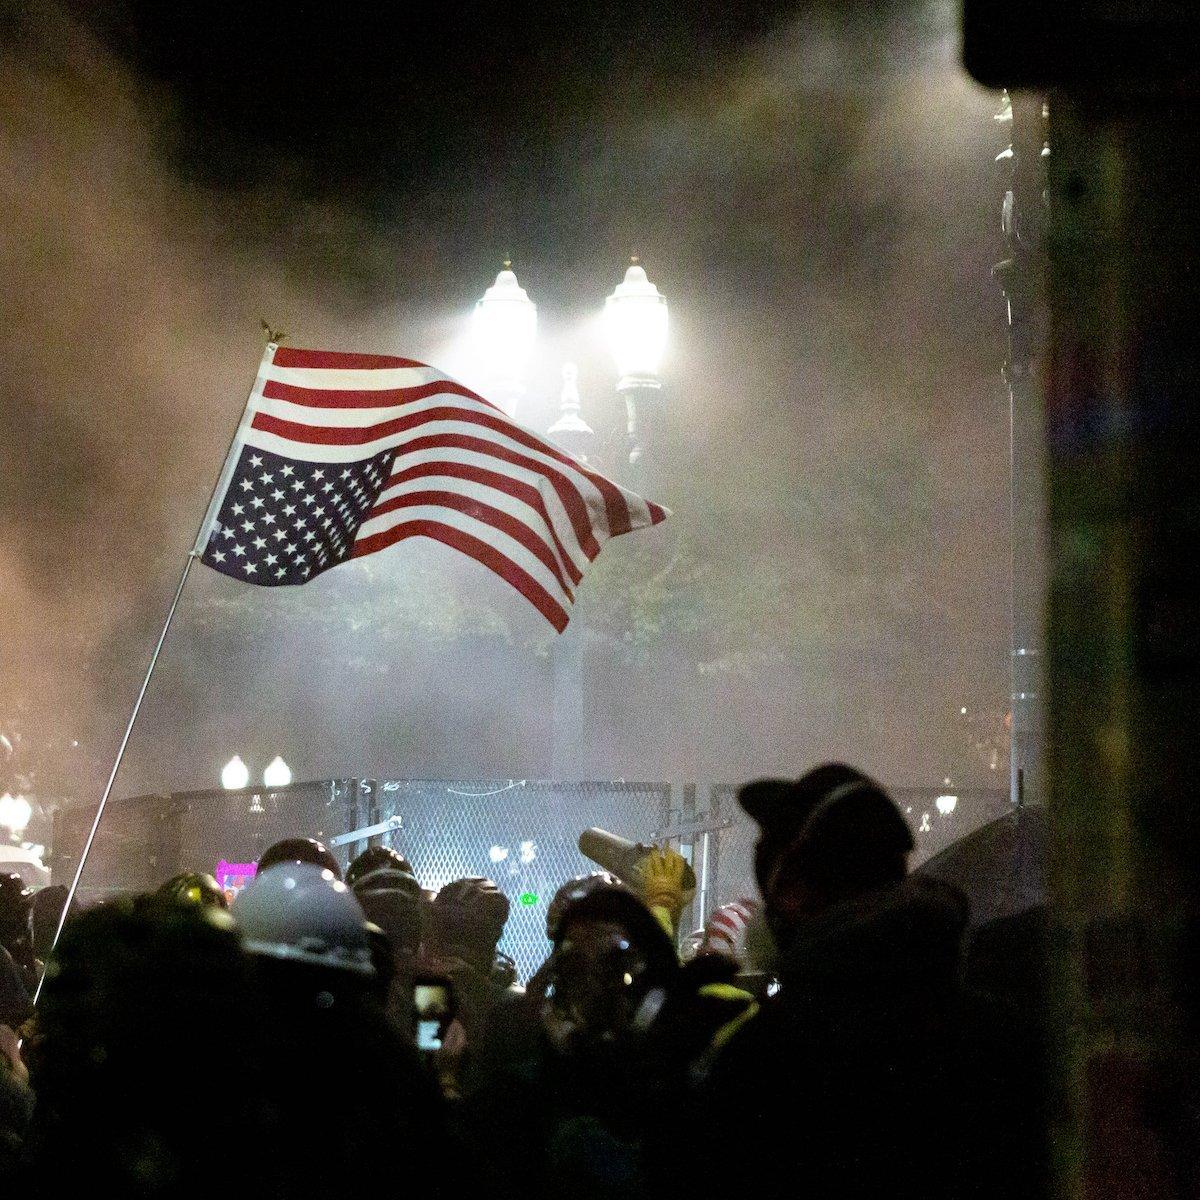 Listen: Protests Erupt in Minnesota After Police Shooting of Black Man